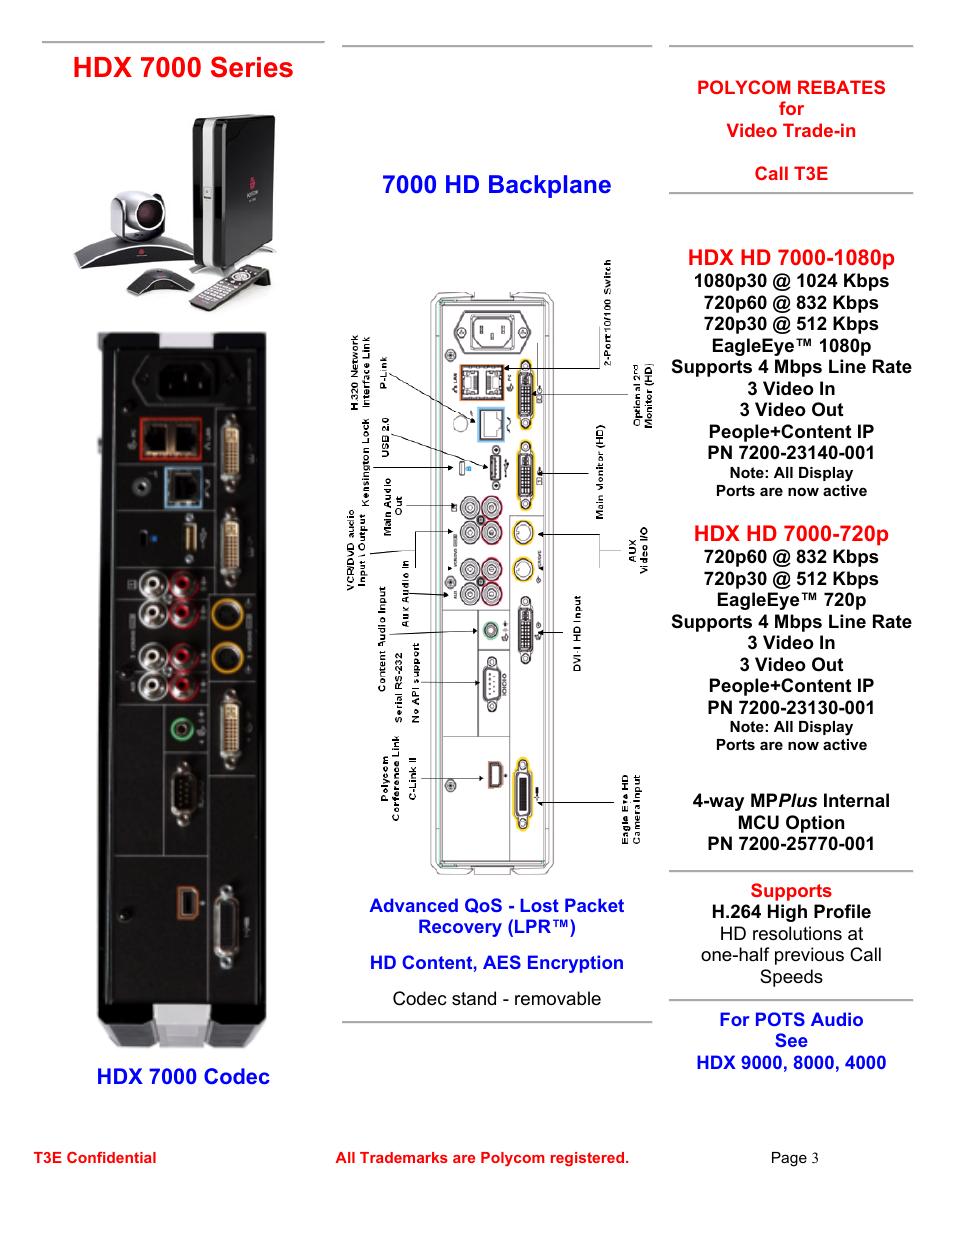 hdx 7000 series 7000 hd backplane hdx 7000 codec polycom rh manualsdir com polycom hdx 7000 setup guide polycom hdx 7000 setup guide